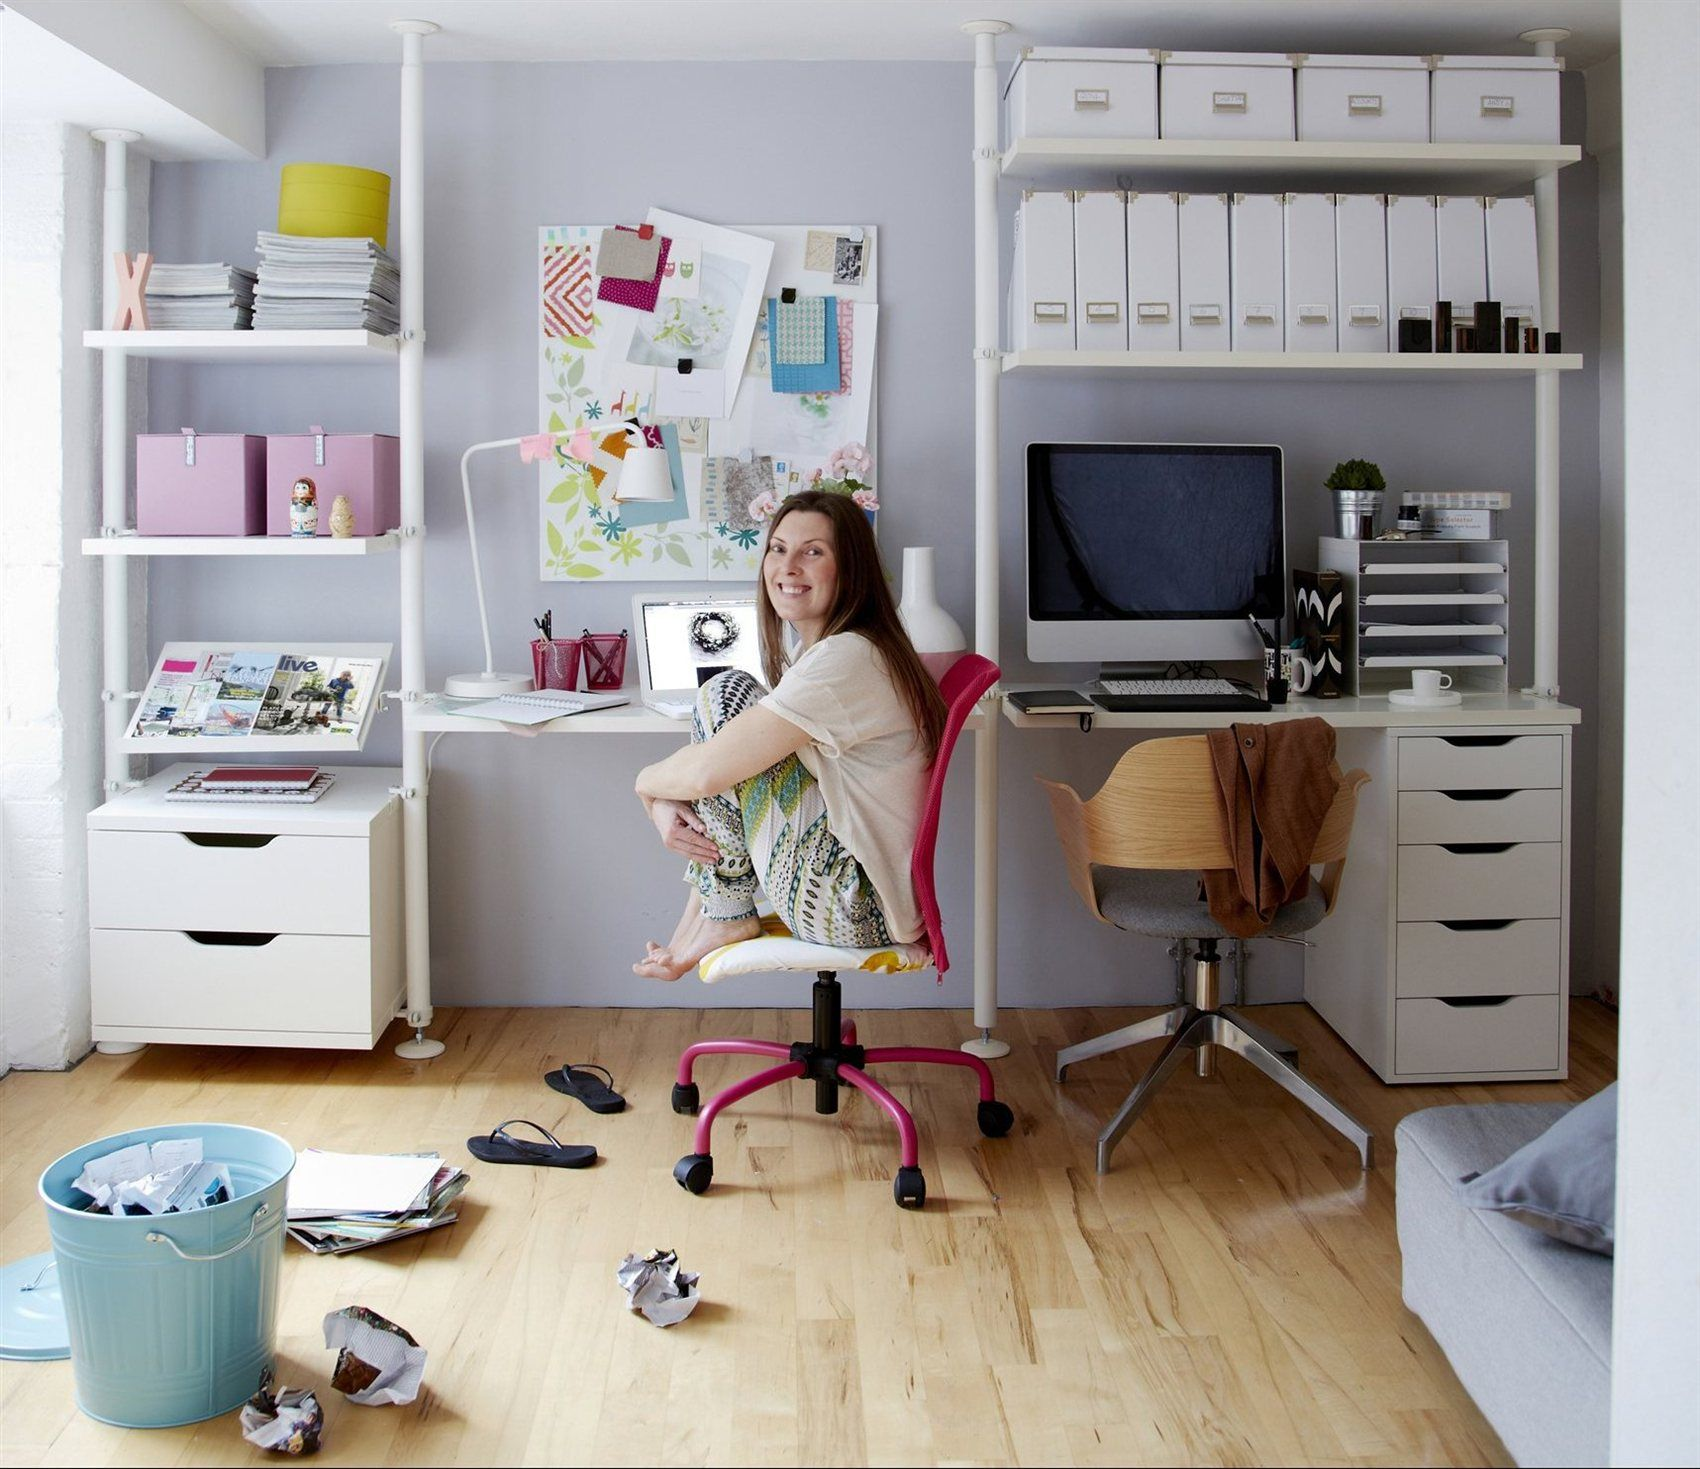 Ideas para una oficina inspiradora en casa decoraci n for Videos porno gratis oficina